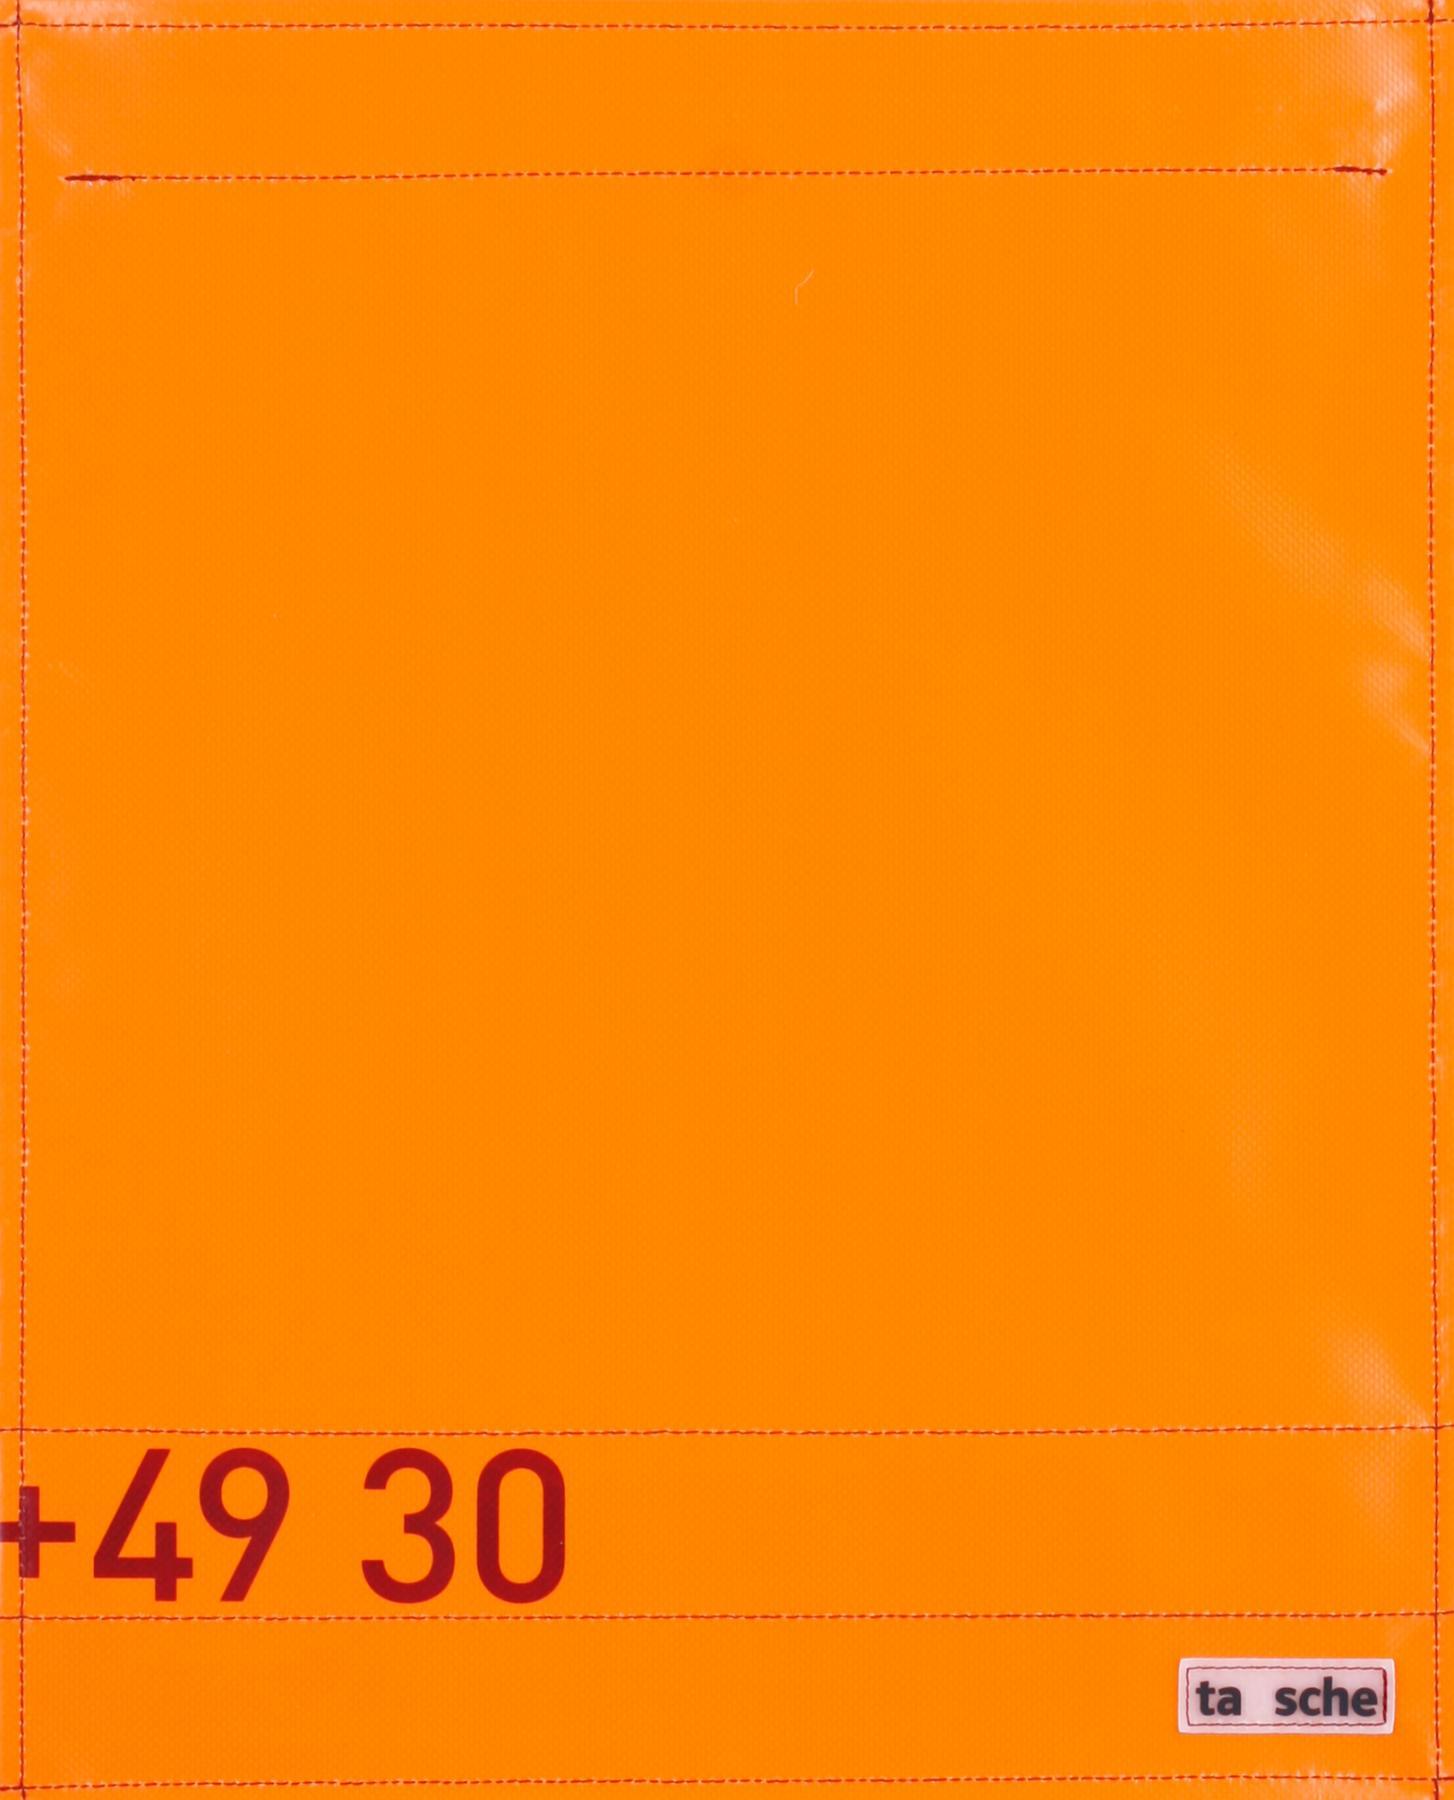 49 30 orange (groß)